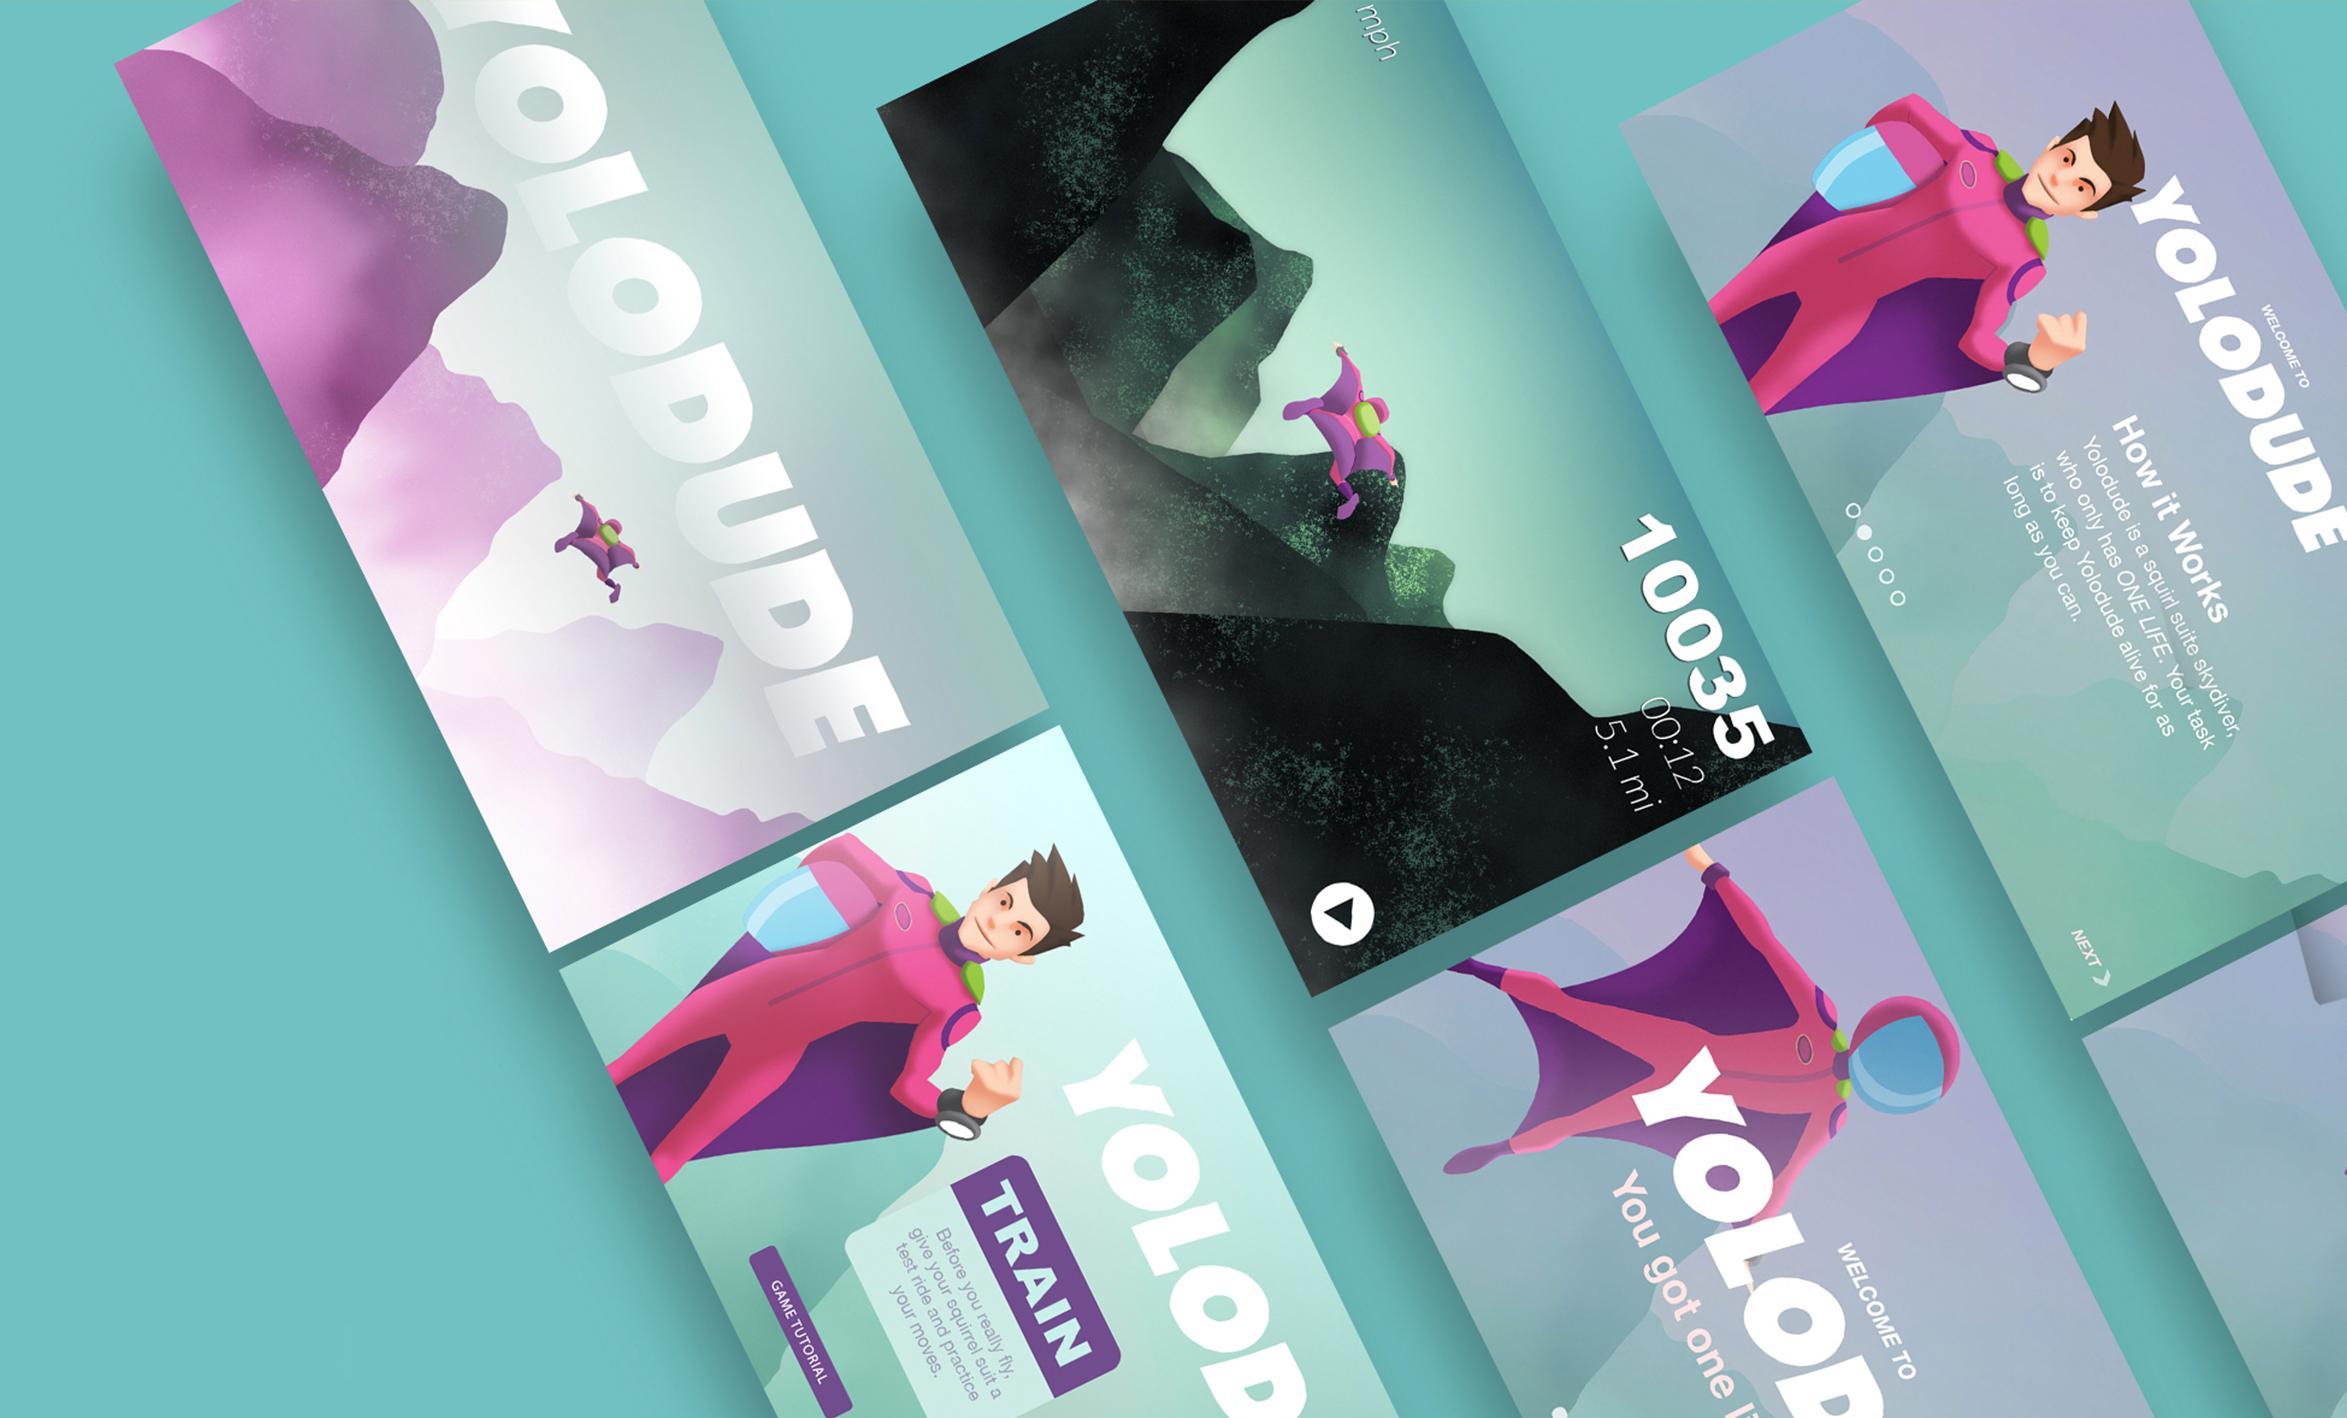 YolodudeScreensv2.jpg